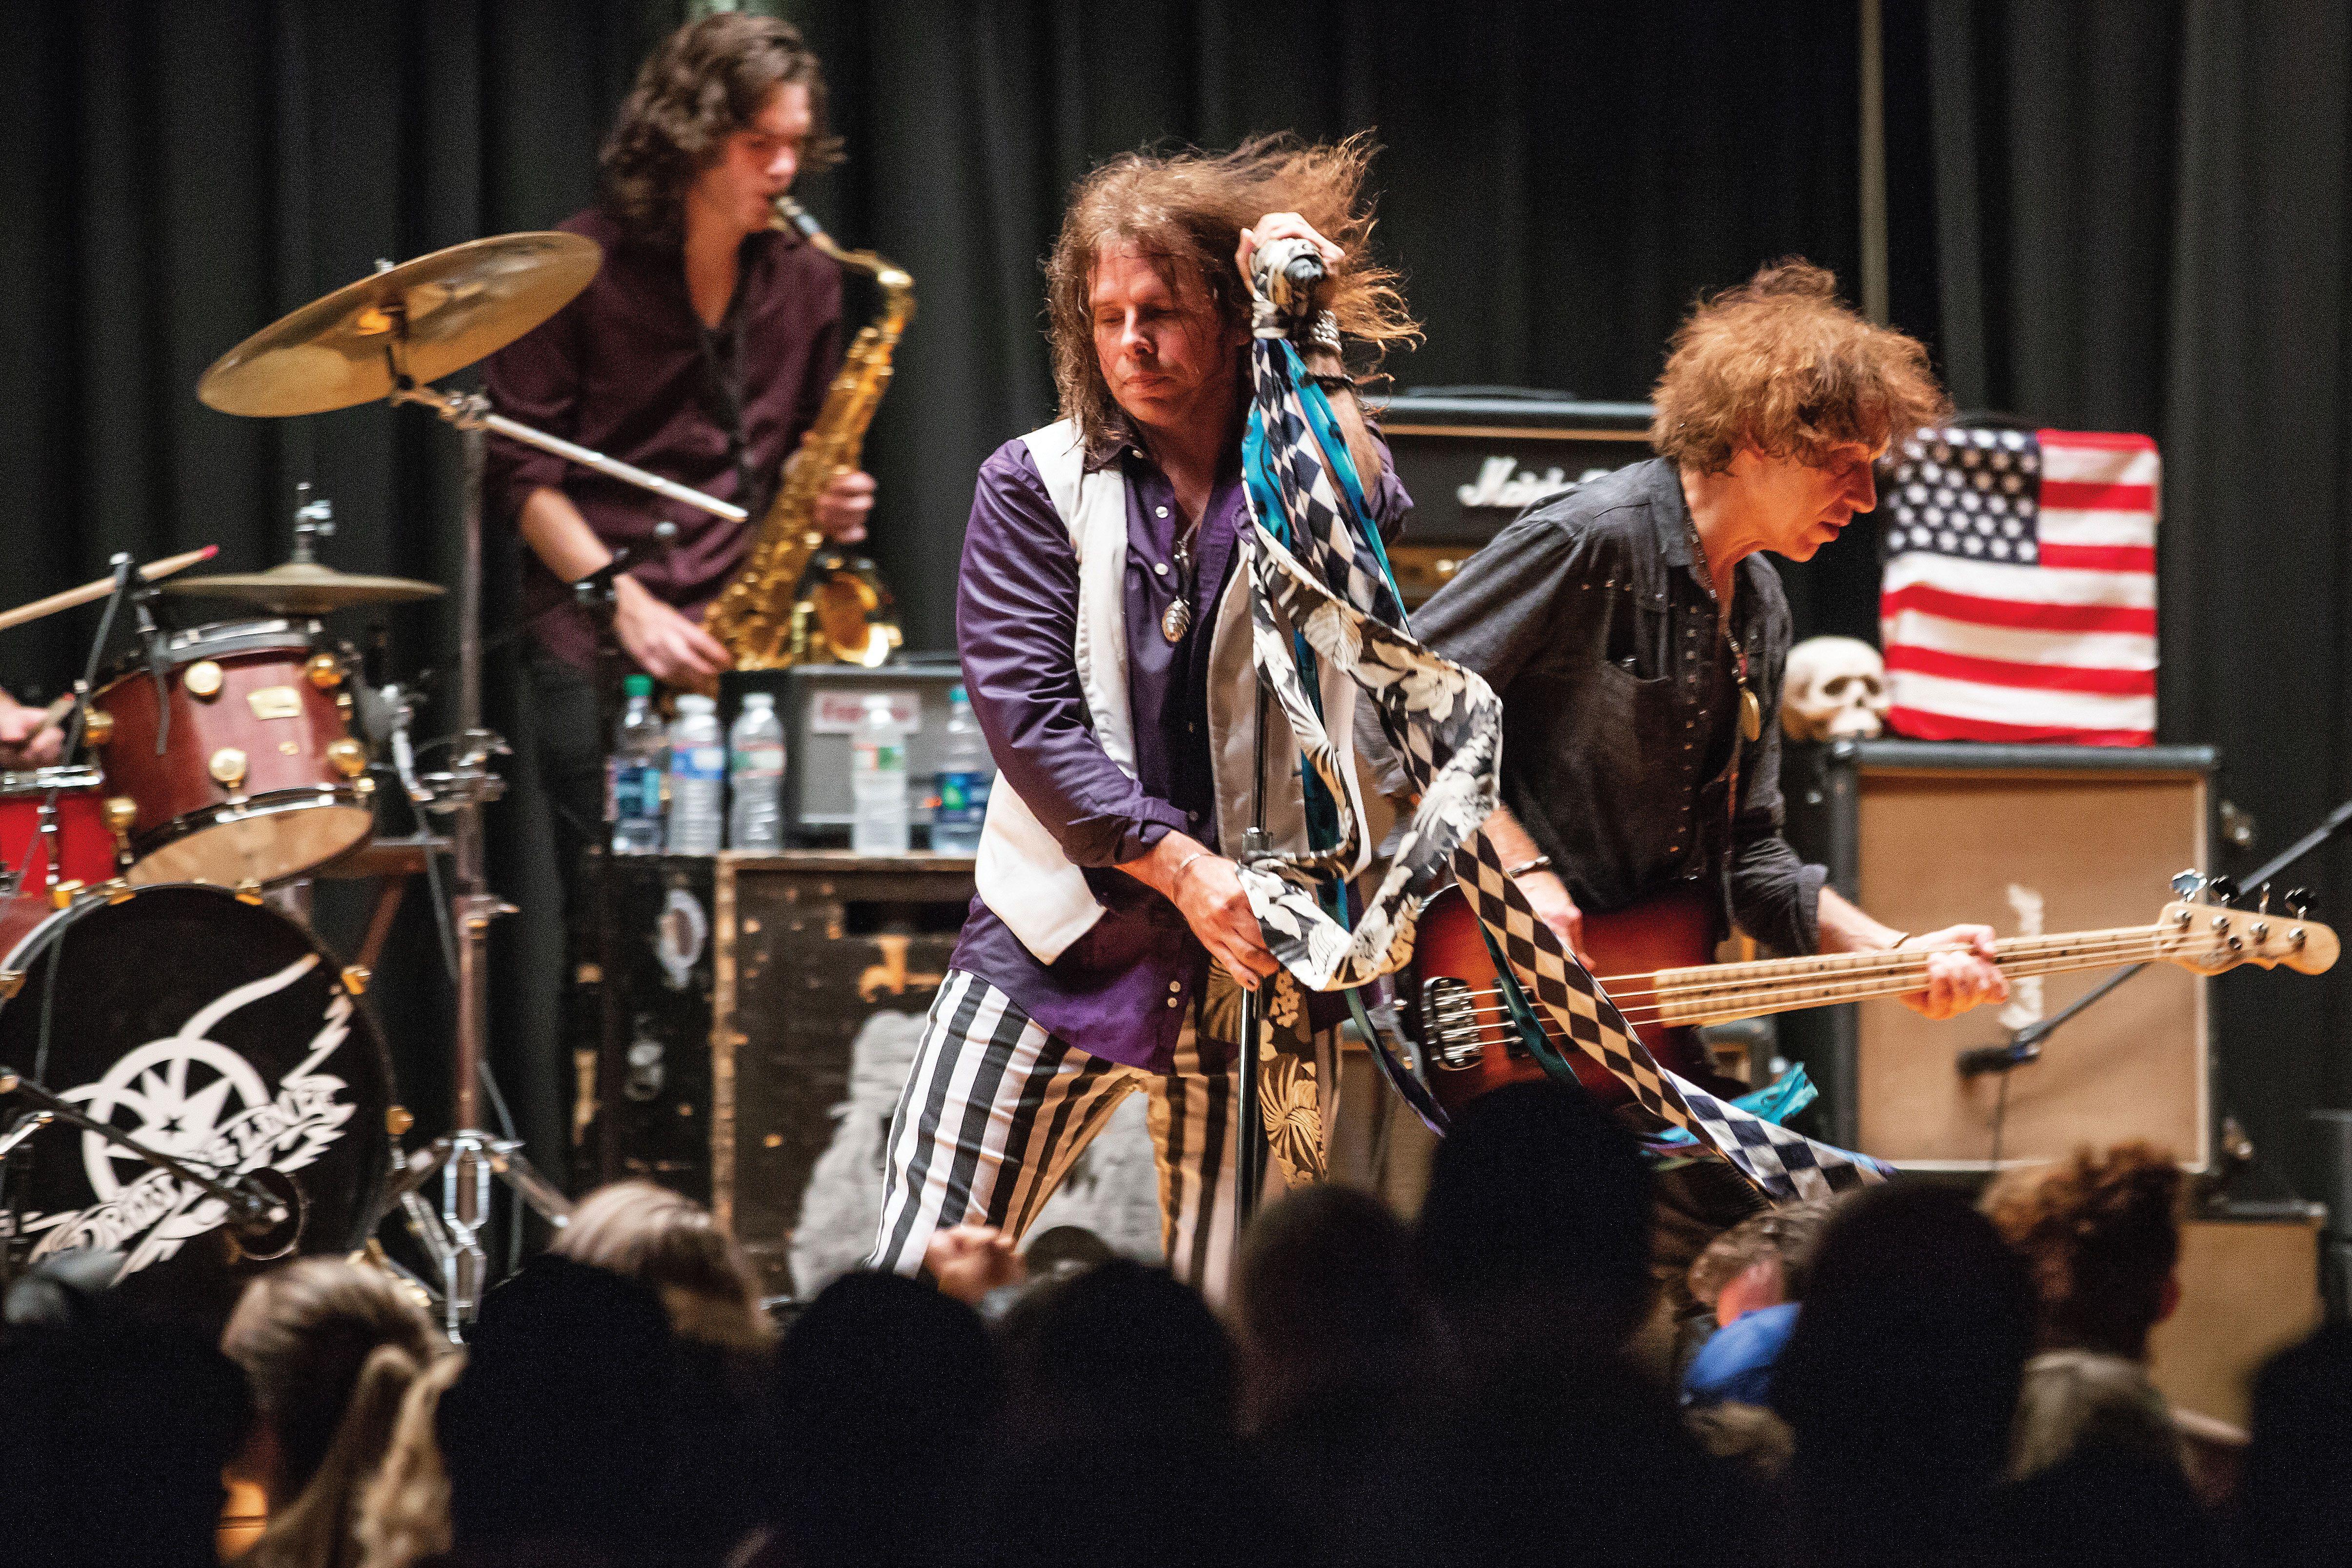 NEW /& OFFICIAL! Aerosmith /'Dude Looks Like A Baby/' Kids T-Shirt